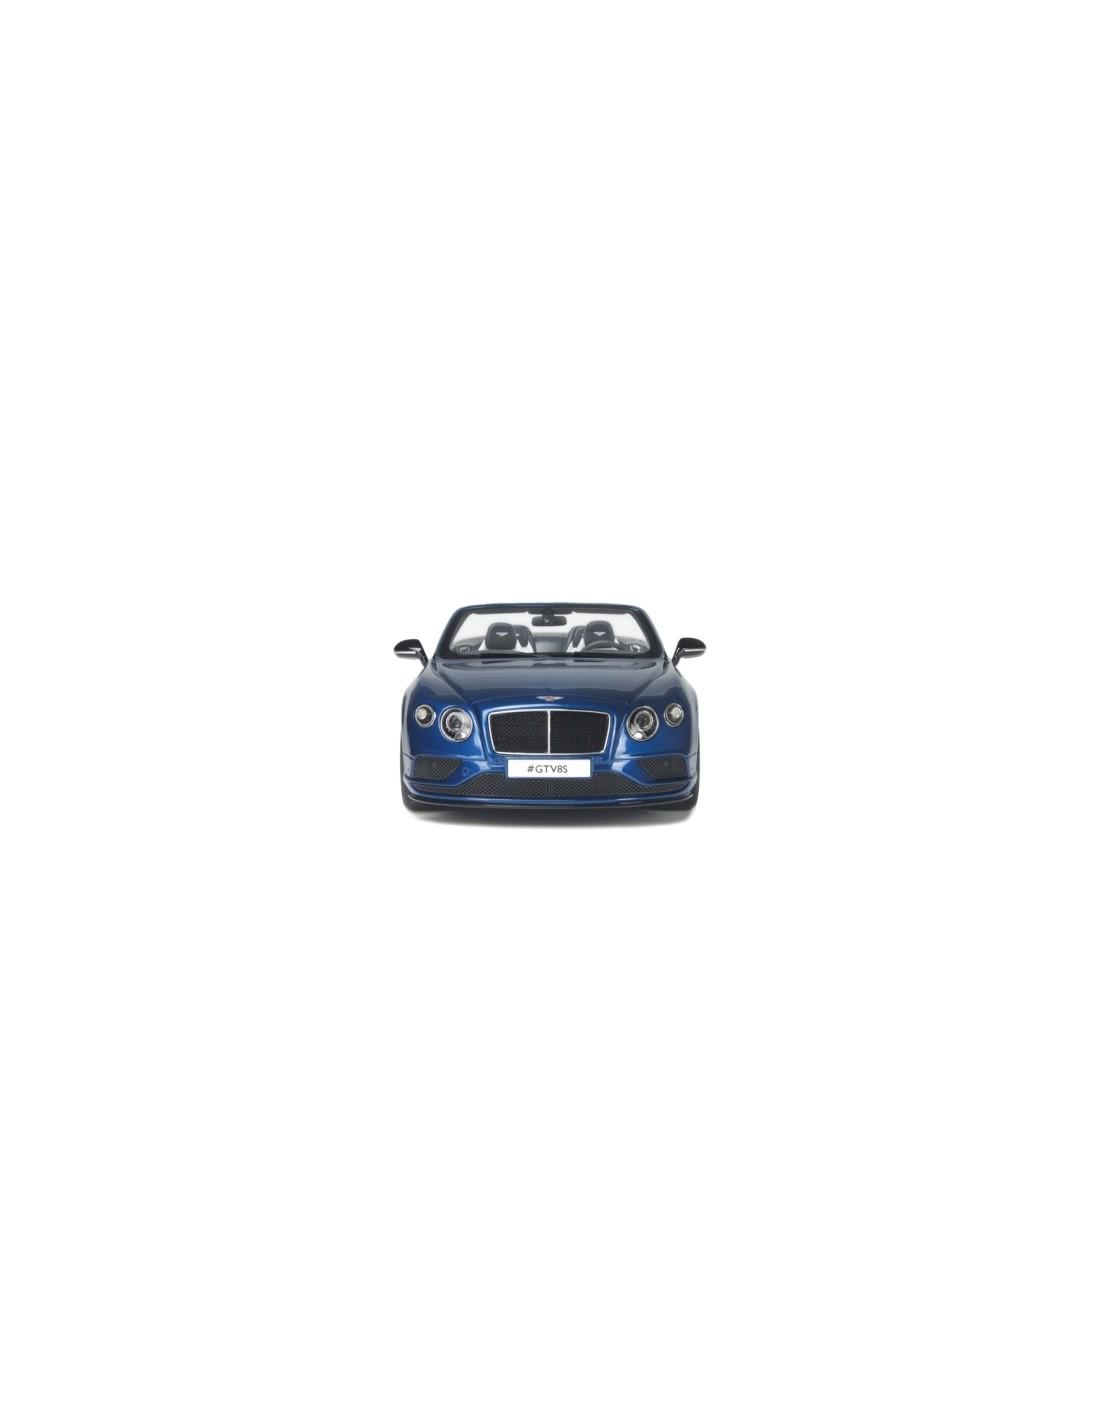 2019 Bentley Continental Gt Msrp: GT Spirit GT076 1/18 BENTLEY CONTINENTAL GT V8 S CABRIOLET